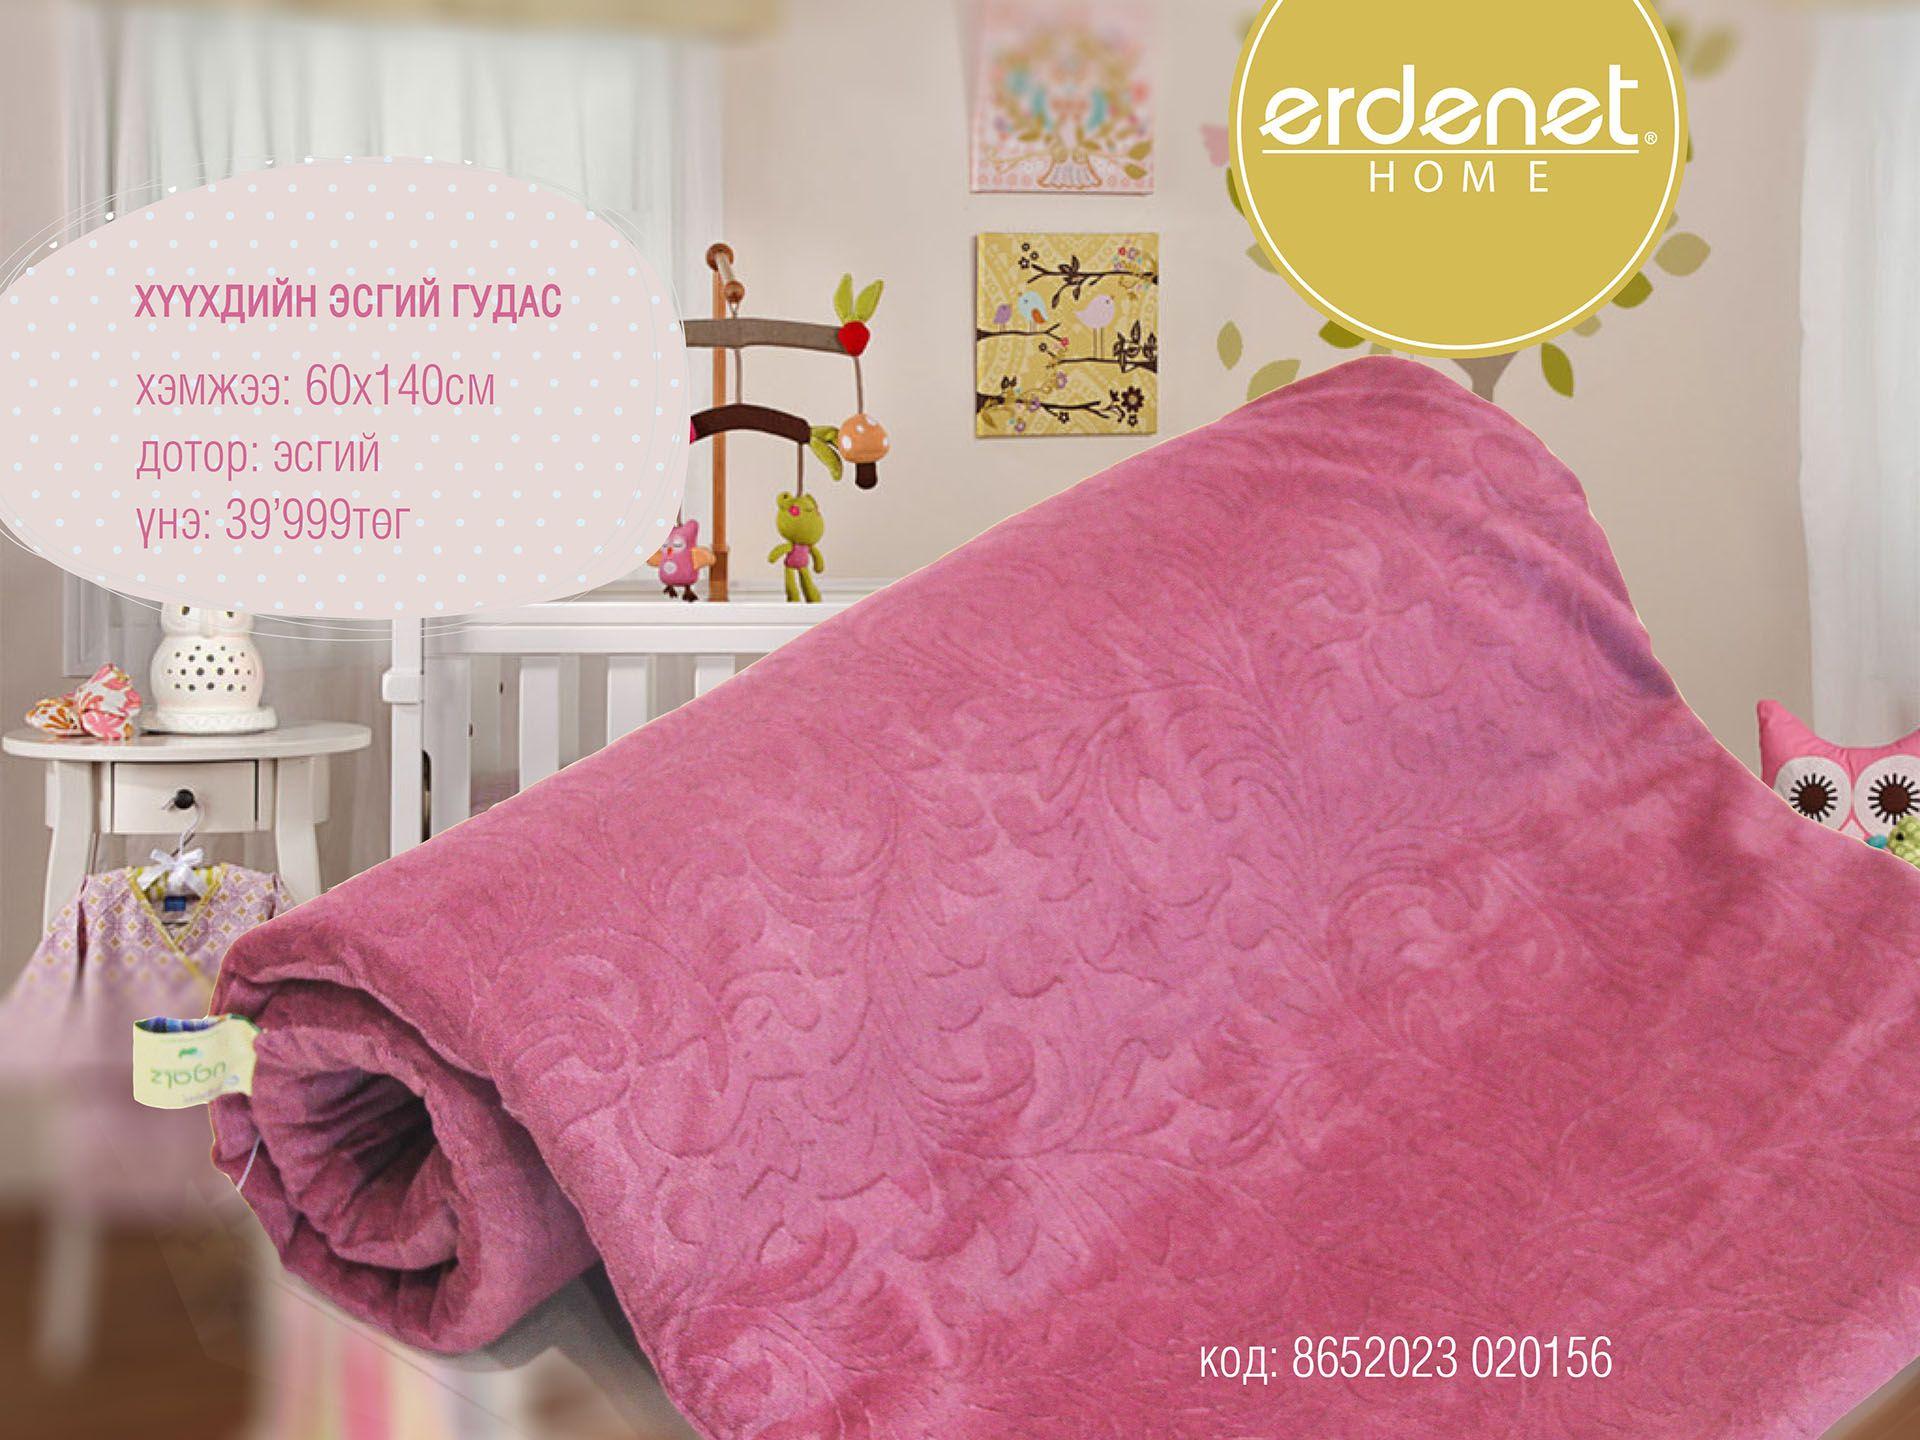 Baby Mattress Mat/Хүүхдийн Гудас size 60x140cm Baby